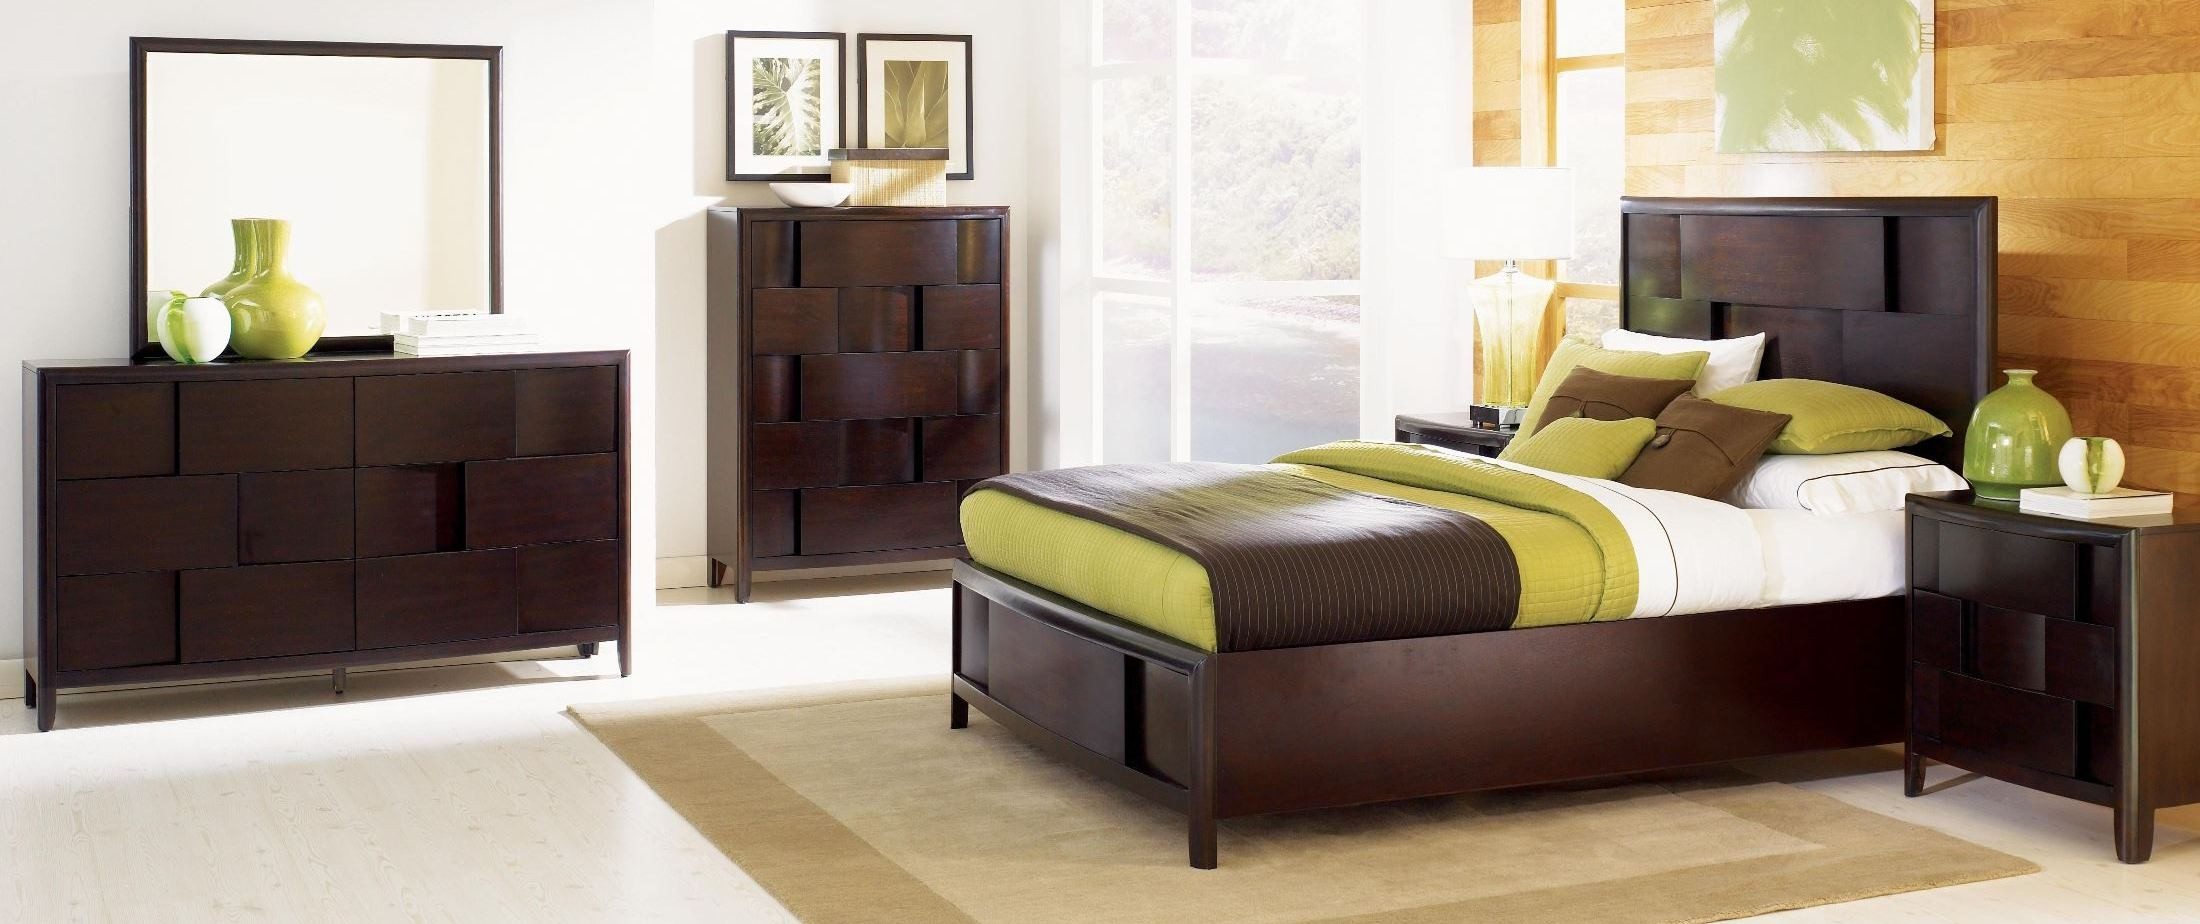 Magnussen Nova Bedroom Set Nova Storage Bedroom Set From Magnussen Home B1428 50h